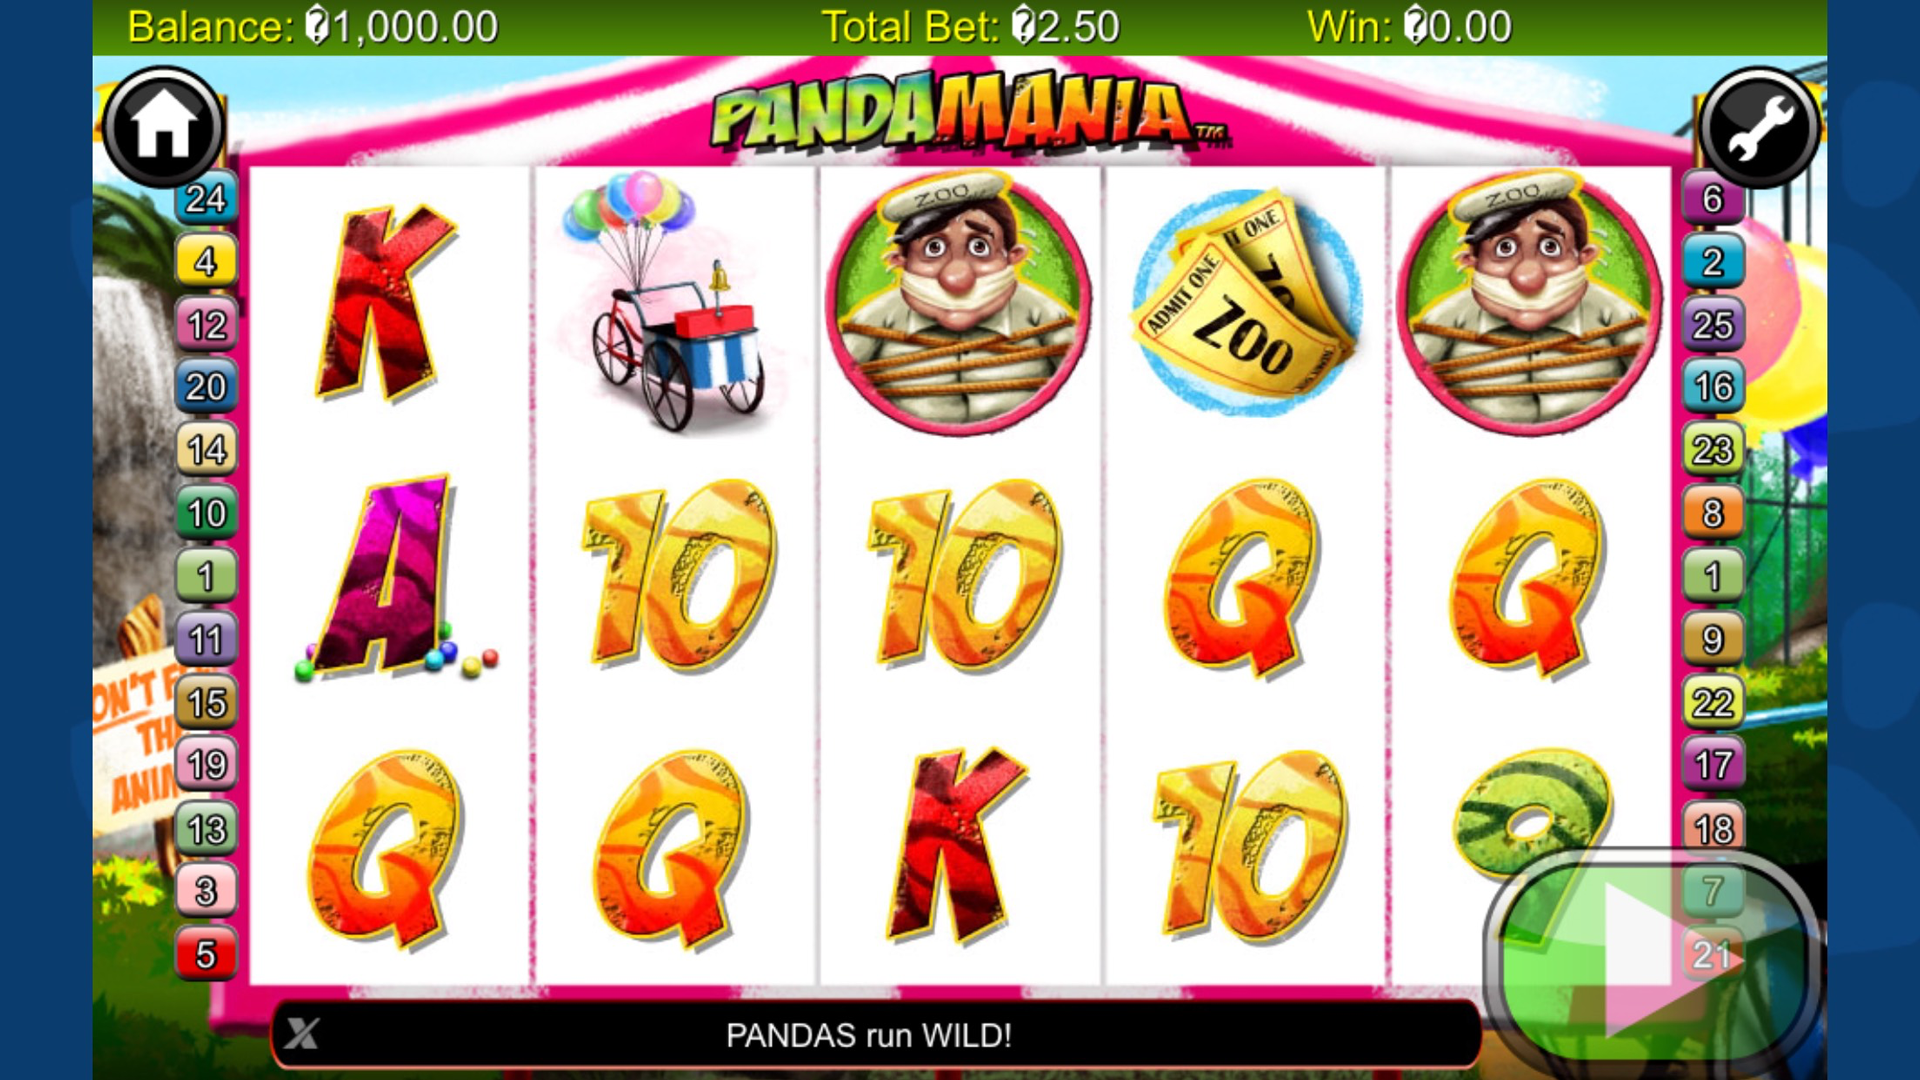 paysafecard casinos deutsch aktuell